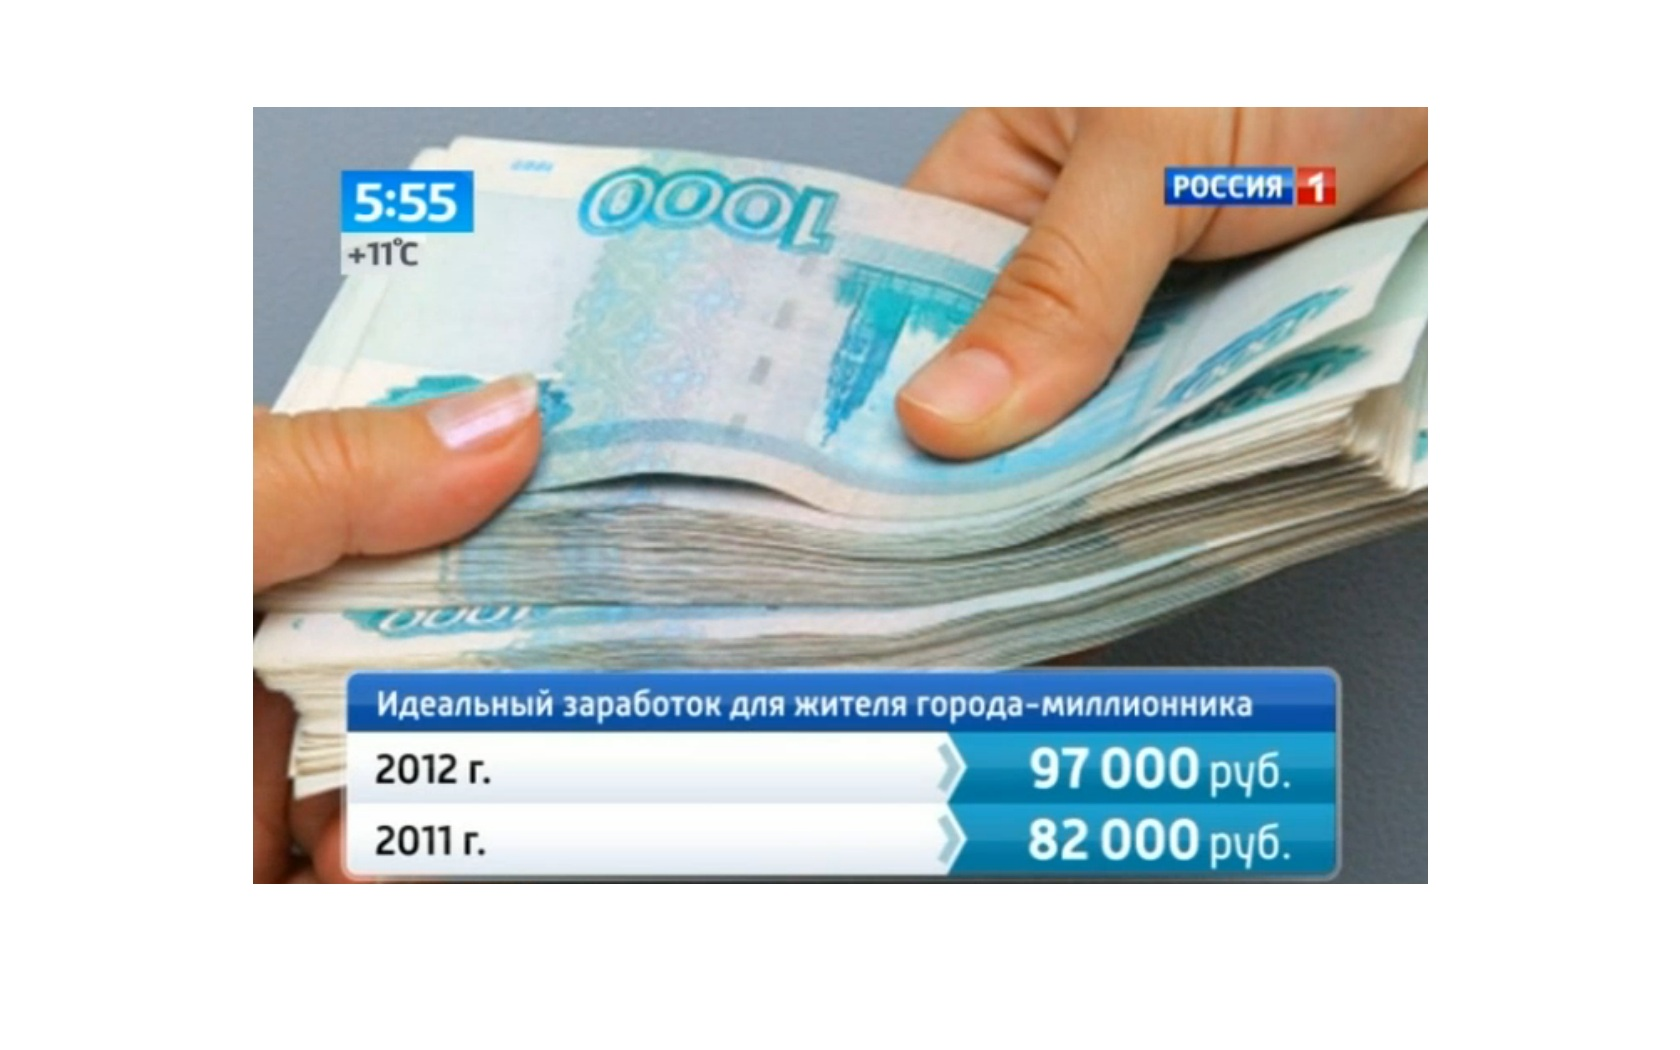 50000 рублей займ срочно на год